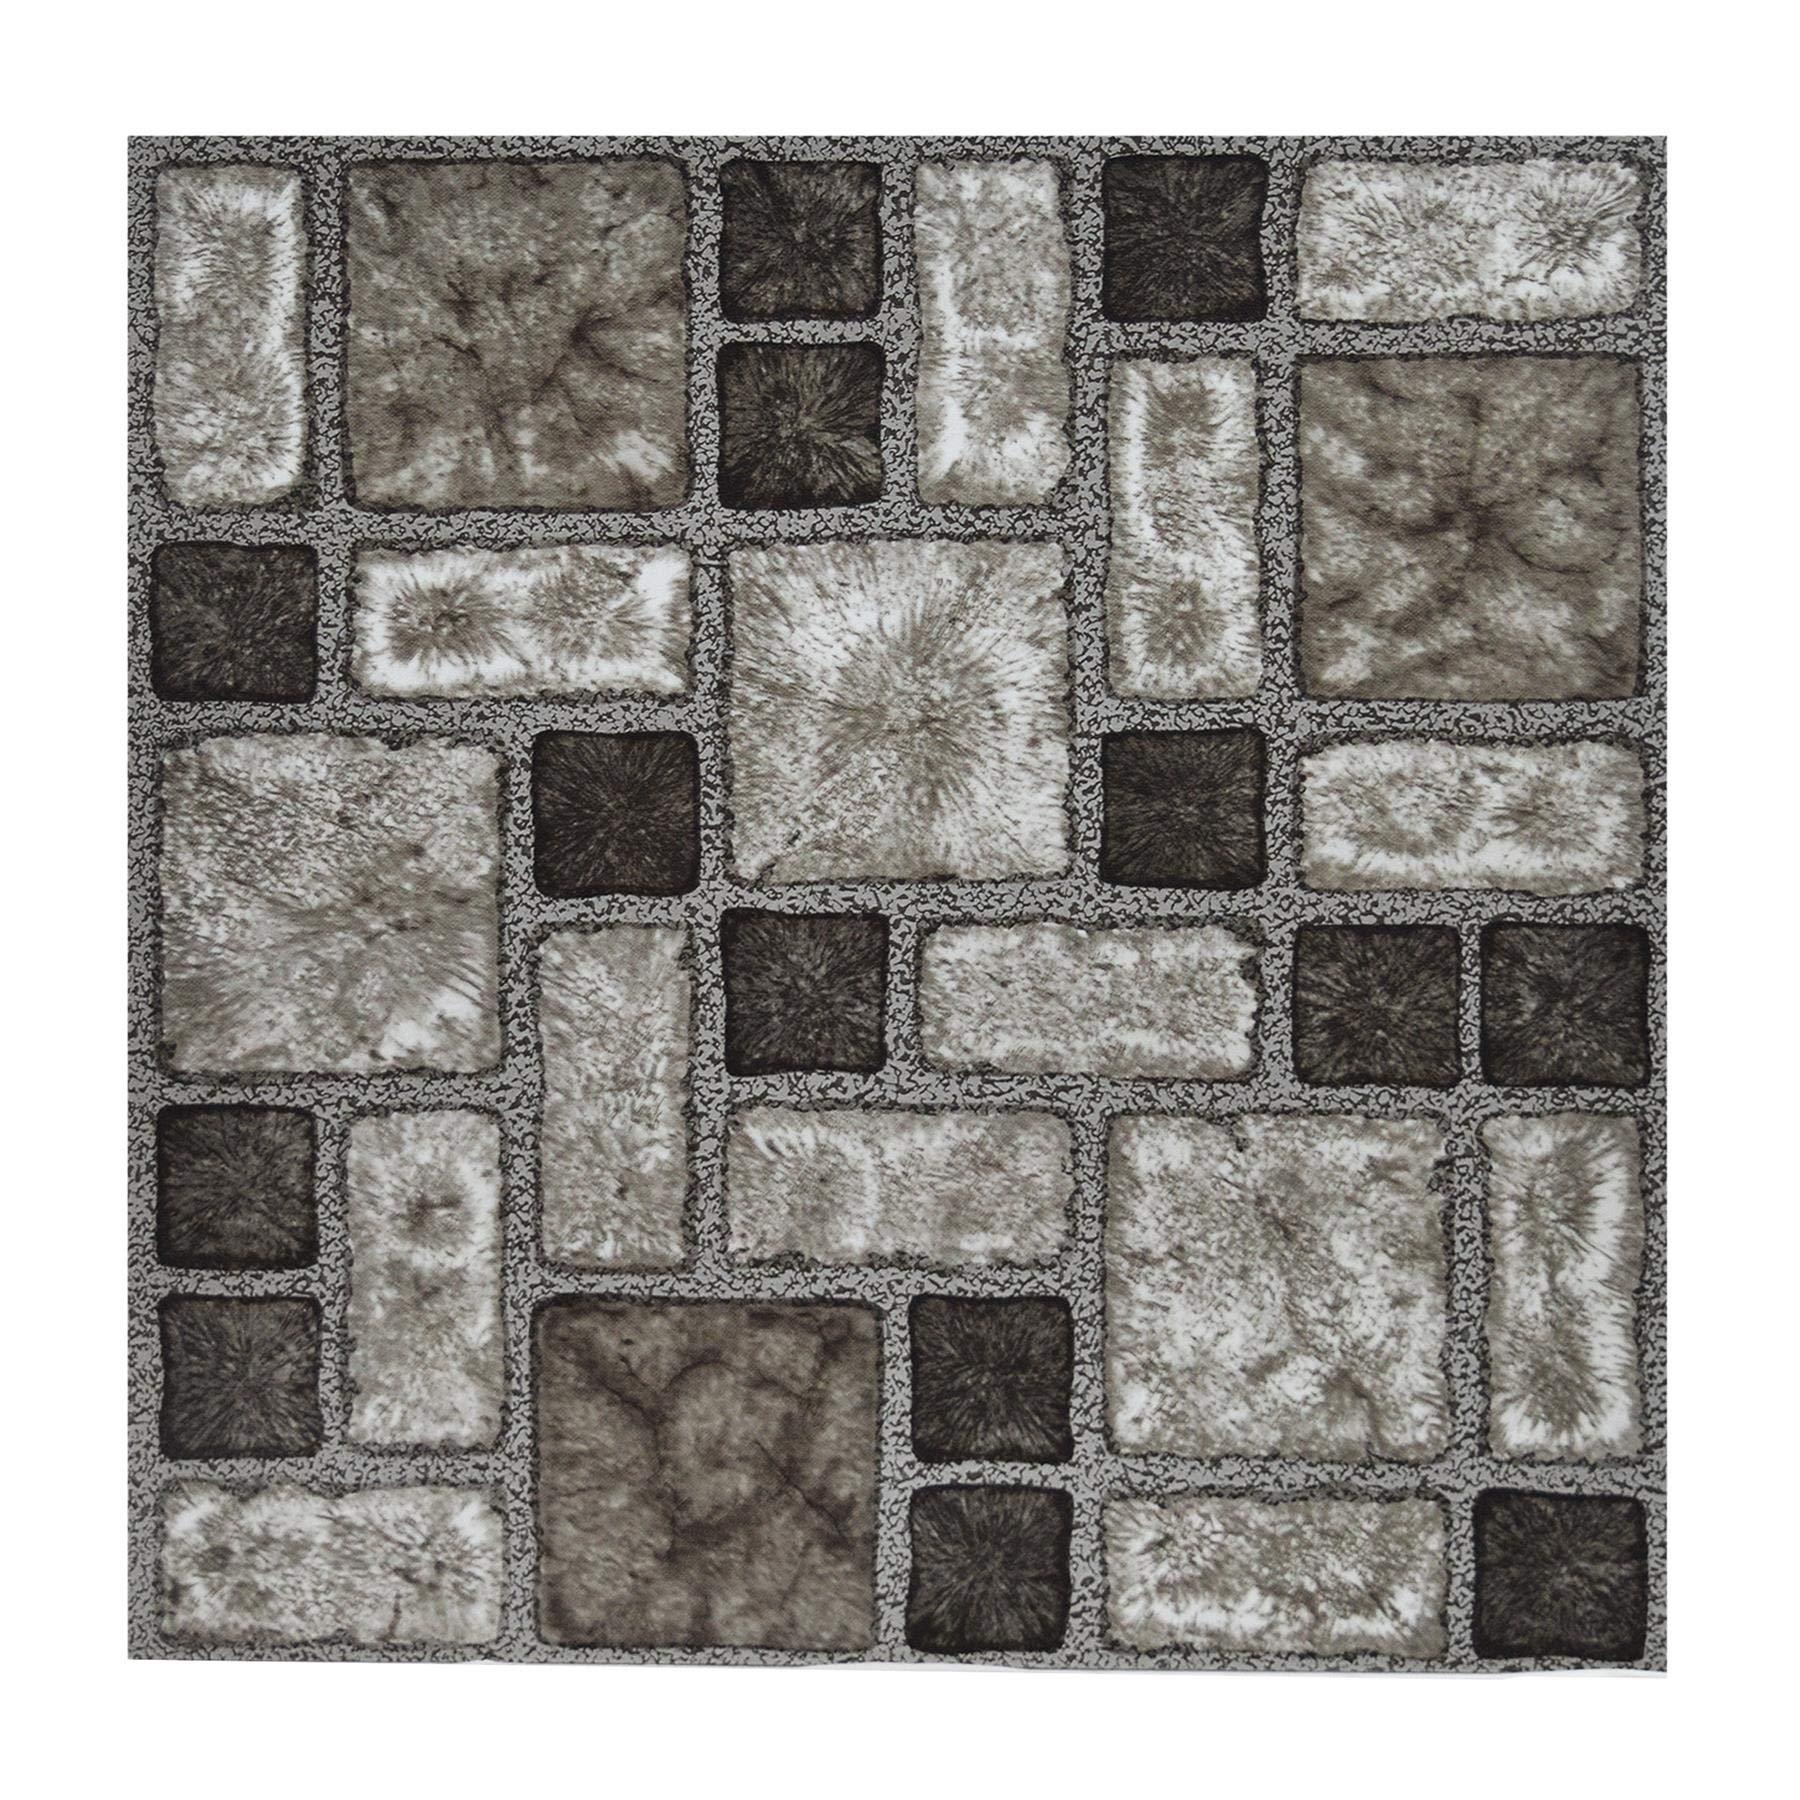 Floor Tiles Self Adhesive Vinyl Flooring Kitchen Bathroom Charcoal Stone Effect Buy Online In Mongolia At Desertcart Productid 159329156